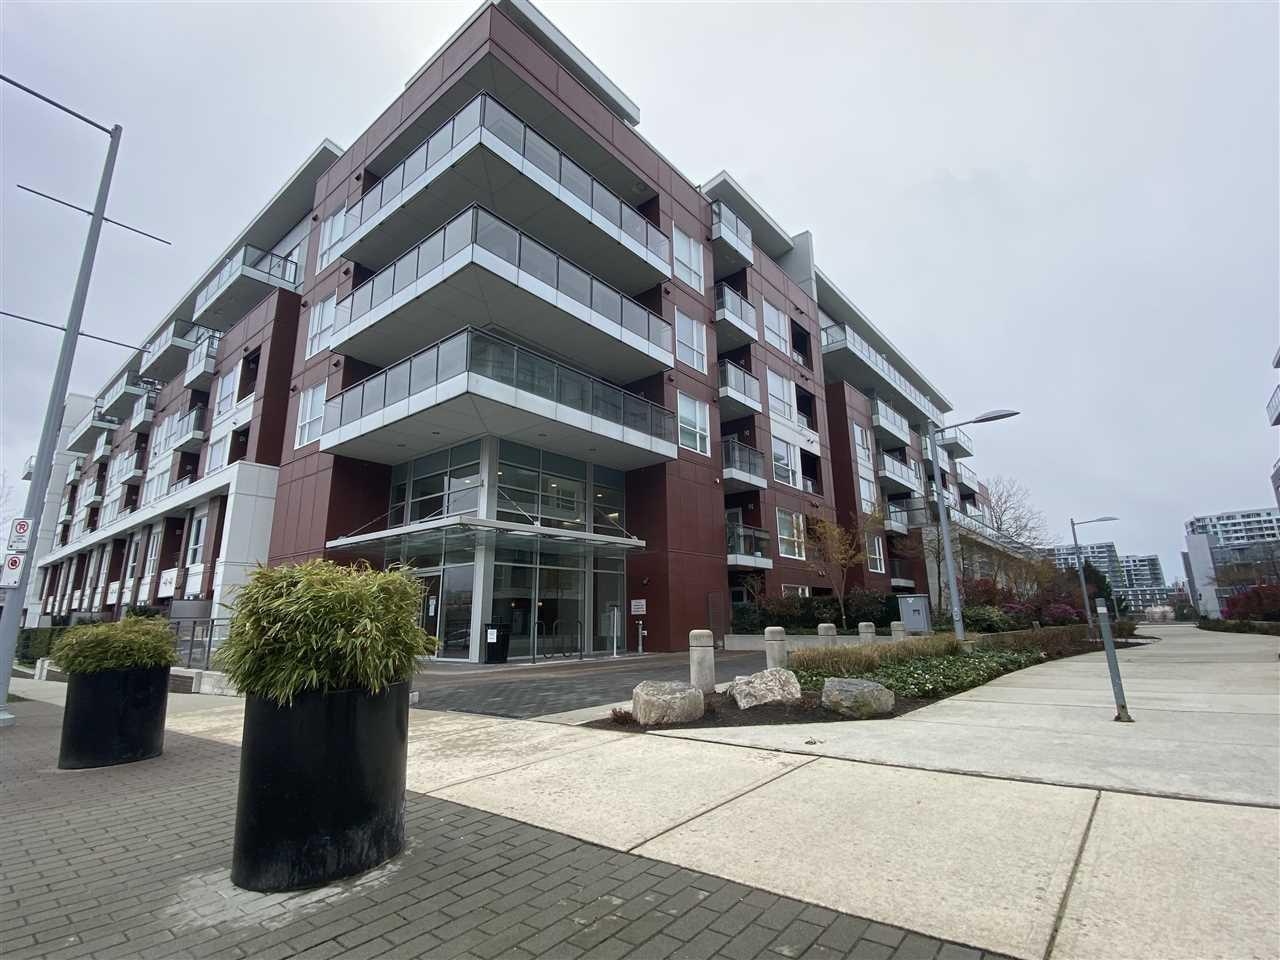 Main Photo: 205 5399 CEDARBRIDGE Way in Richmond: Brighouse Condo for sale : MLS®# R2448345